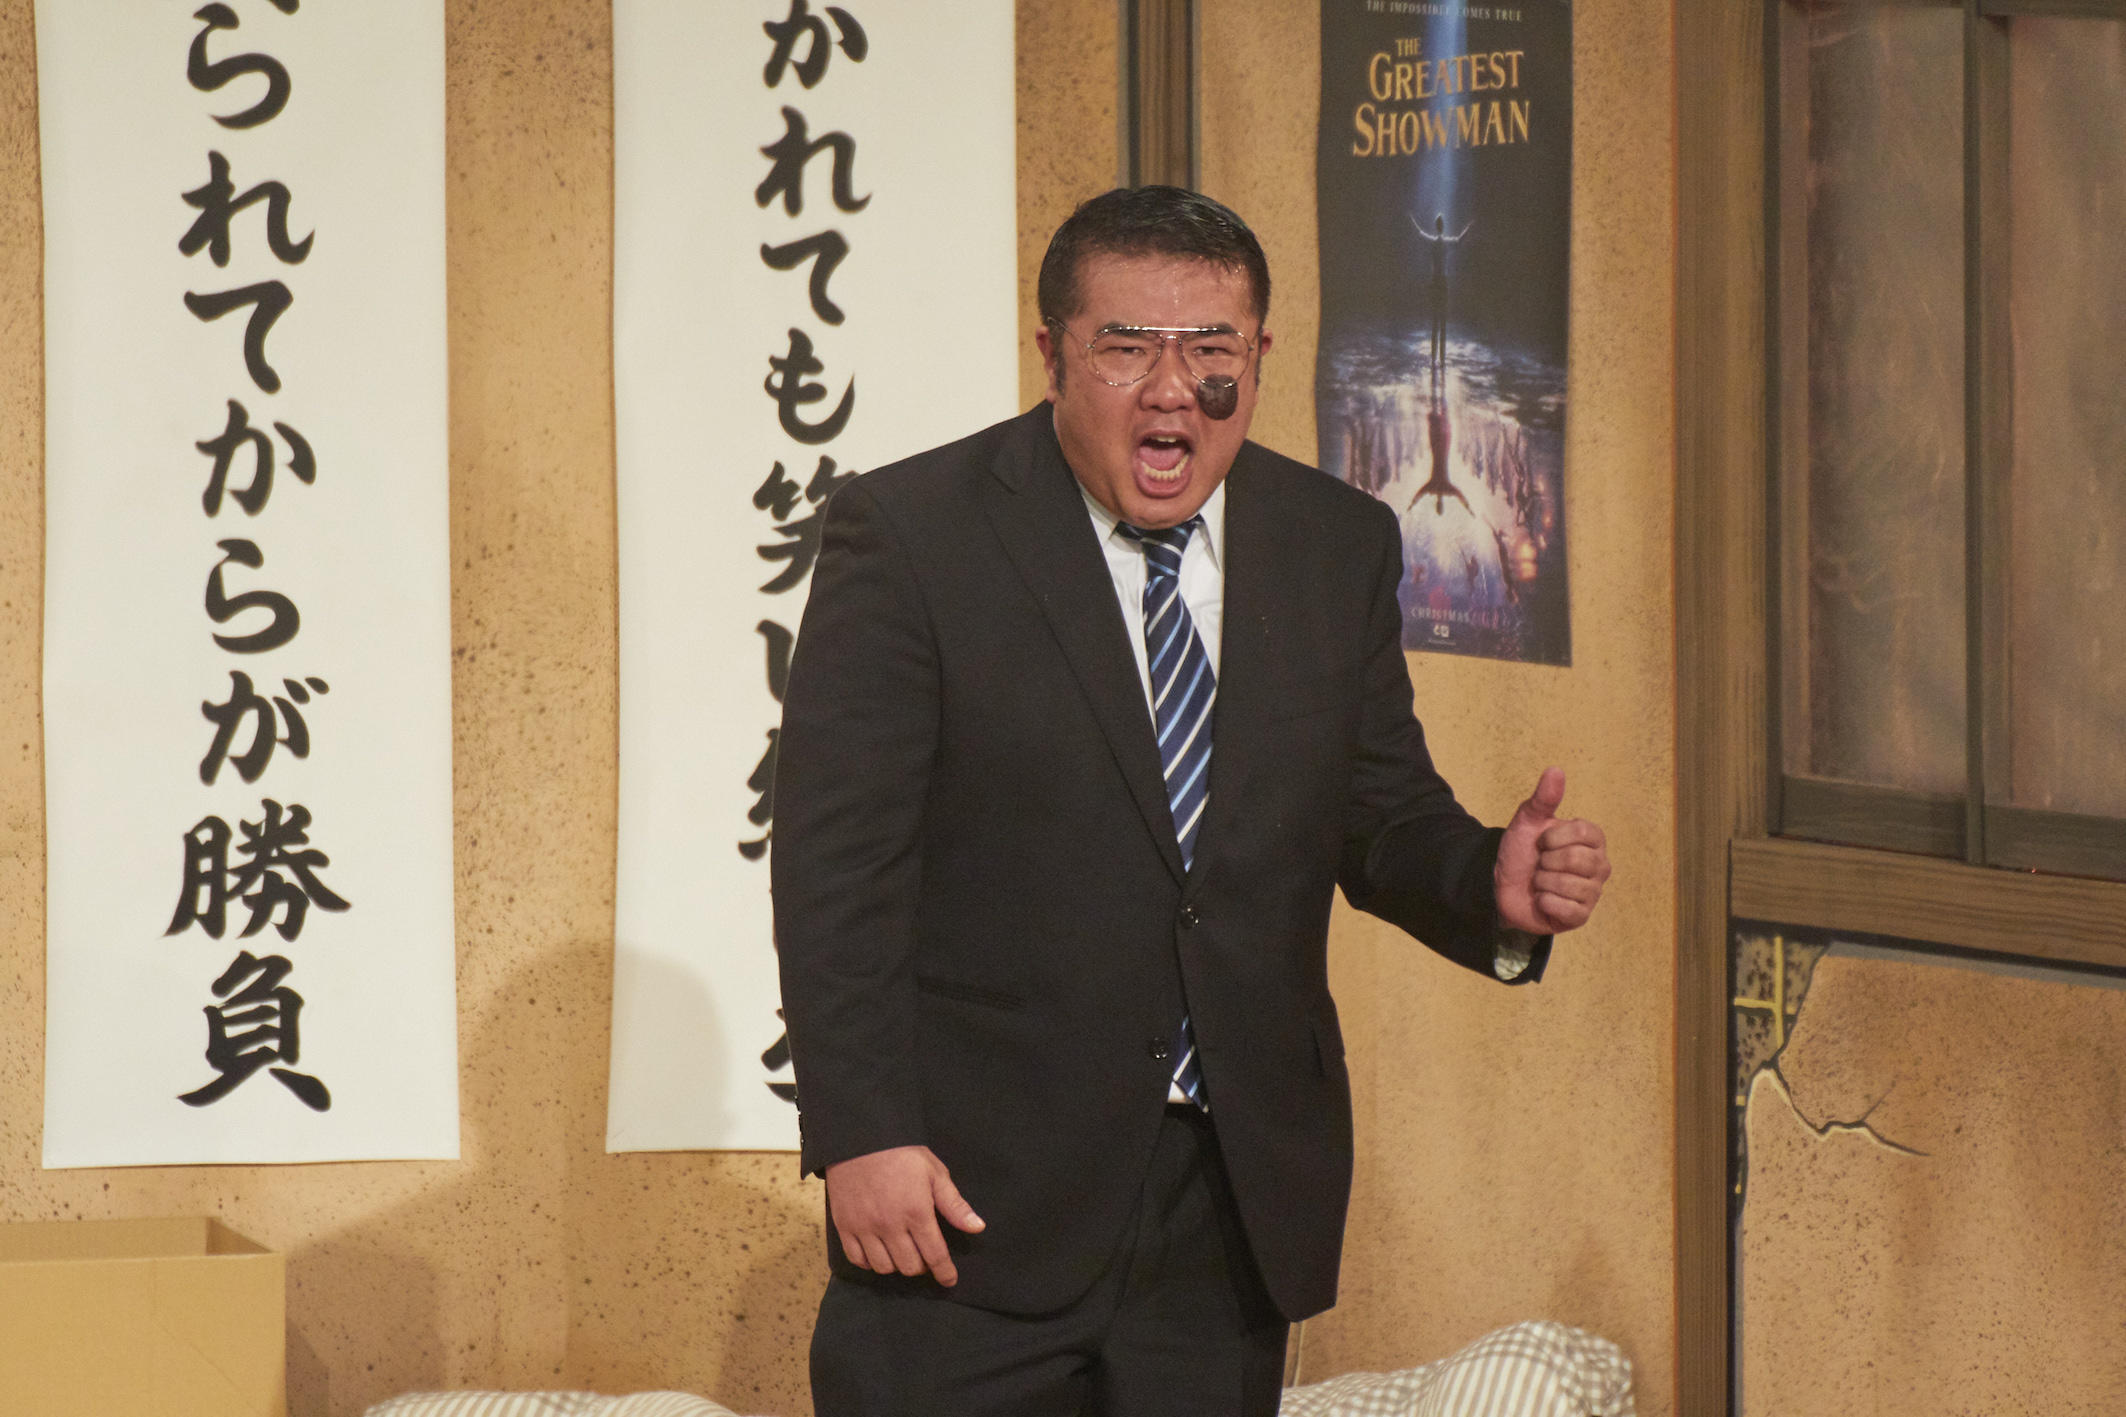 http://news.yoshimoto.co.jp/20190201161106-8b4746d4978ae3c656a36e33bb3de27e93c8a911.jpg